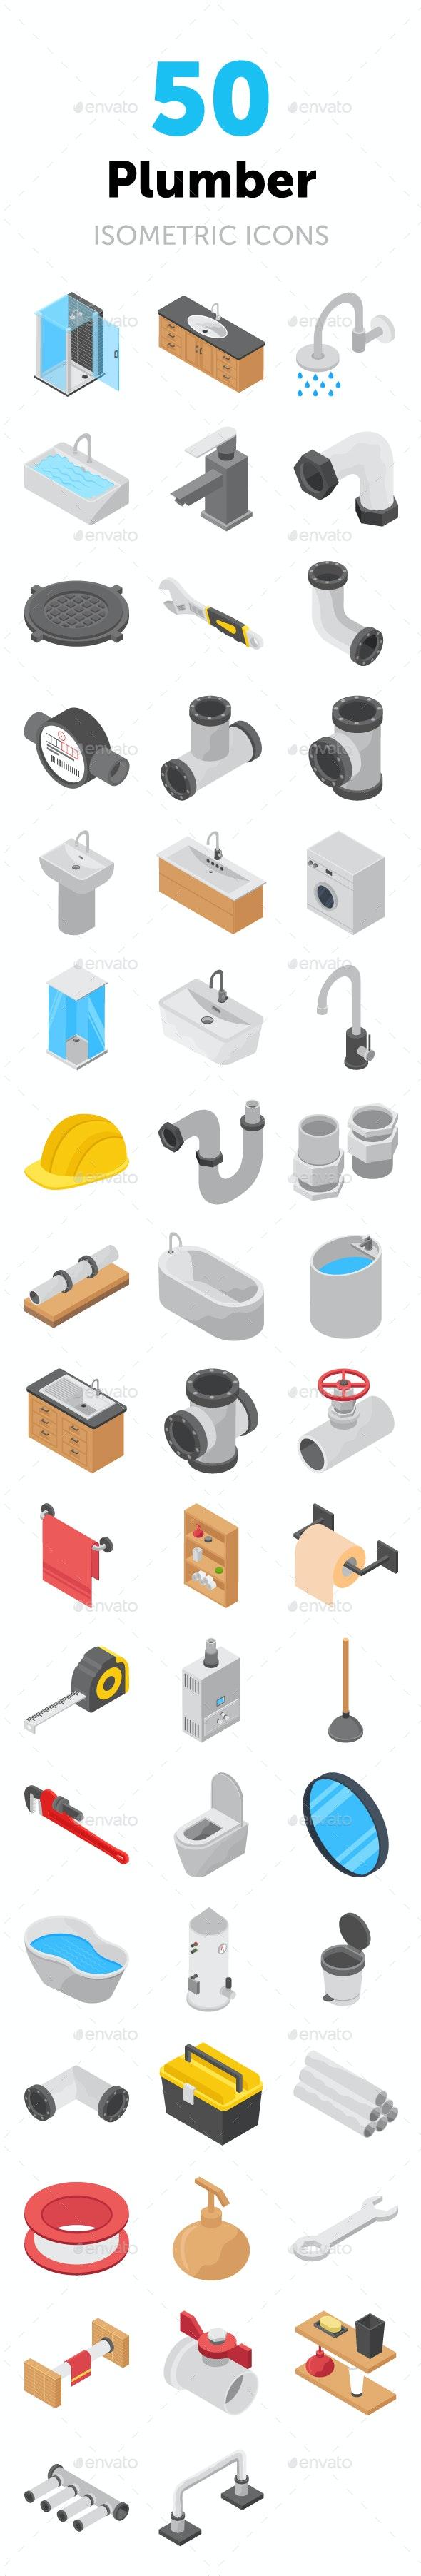 50 Plumber Isometric Icons - Icons